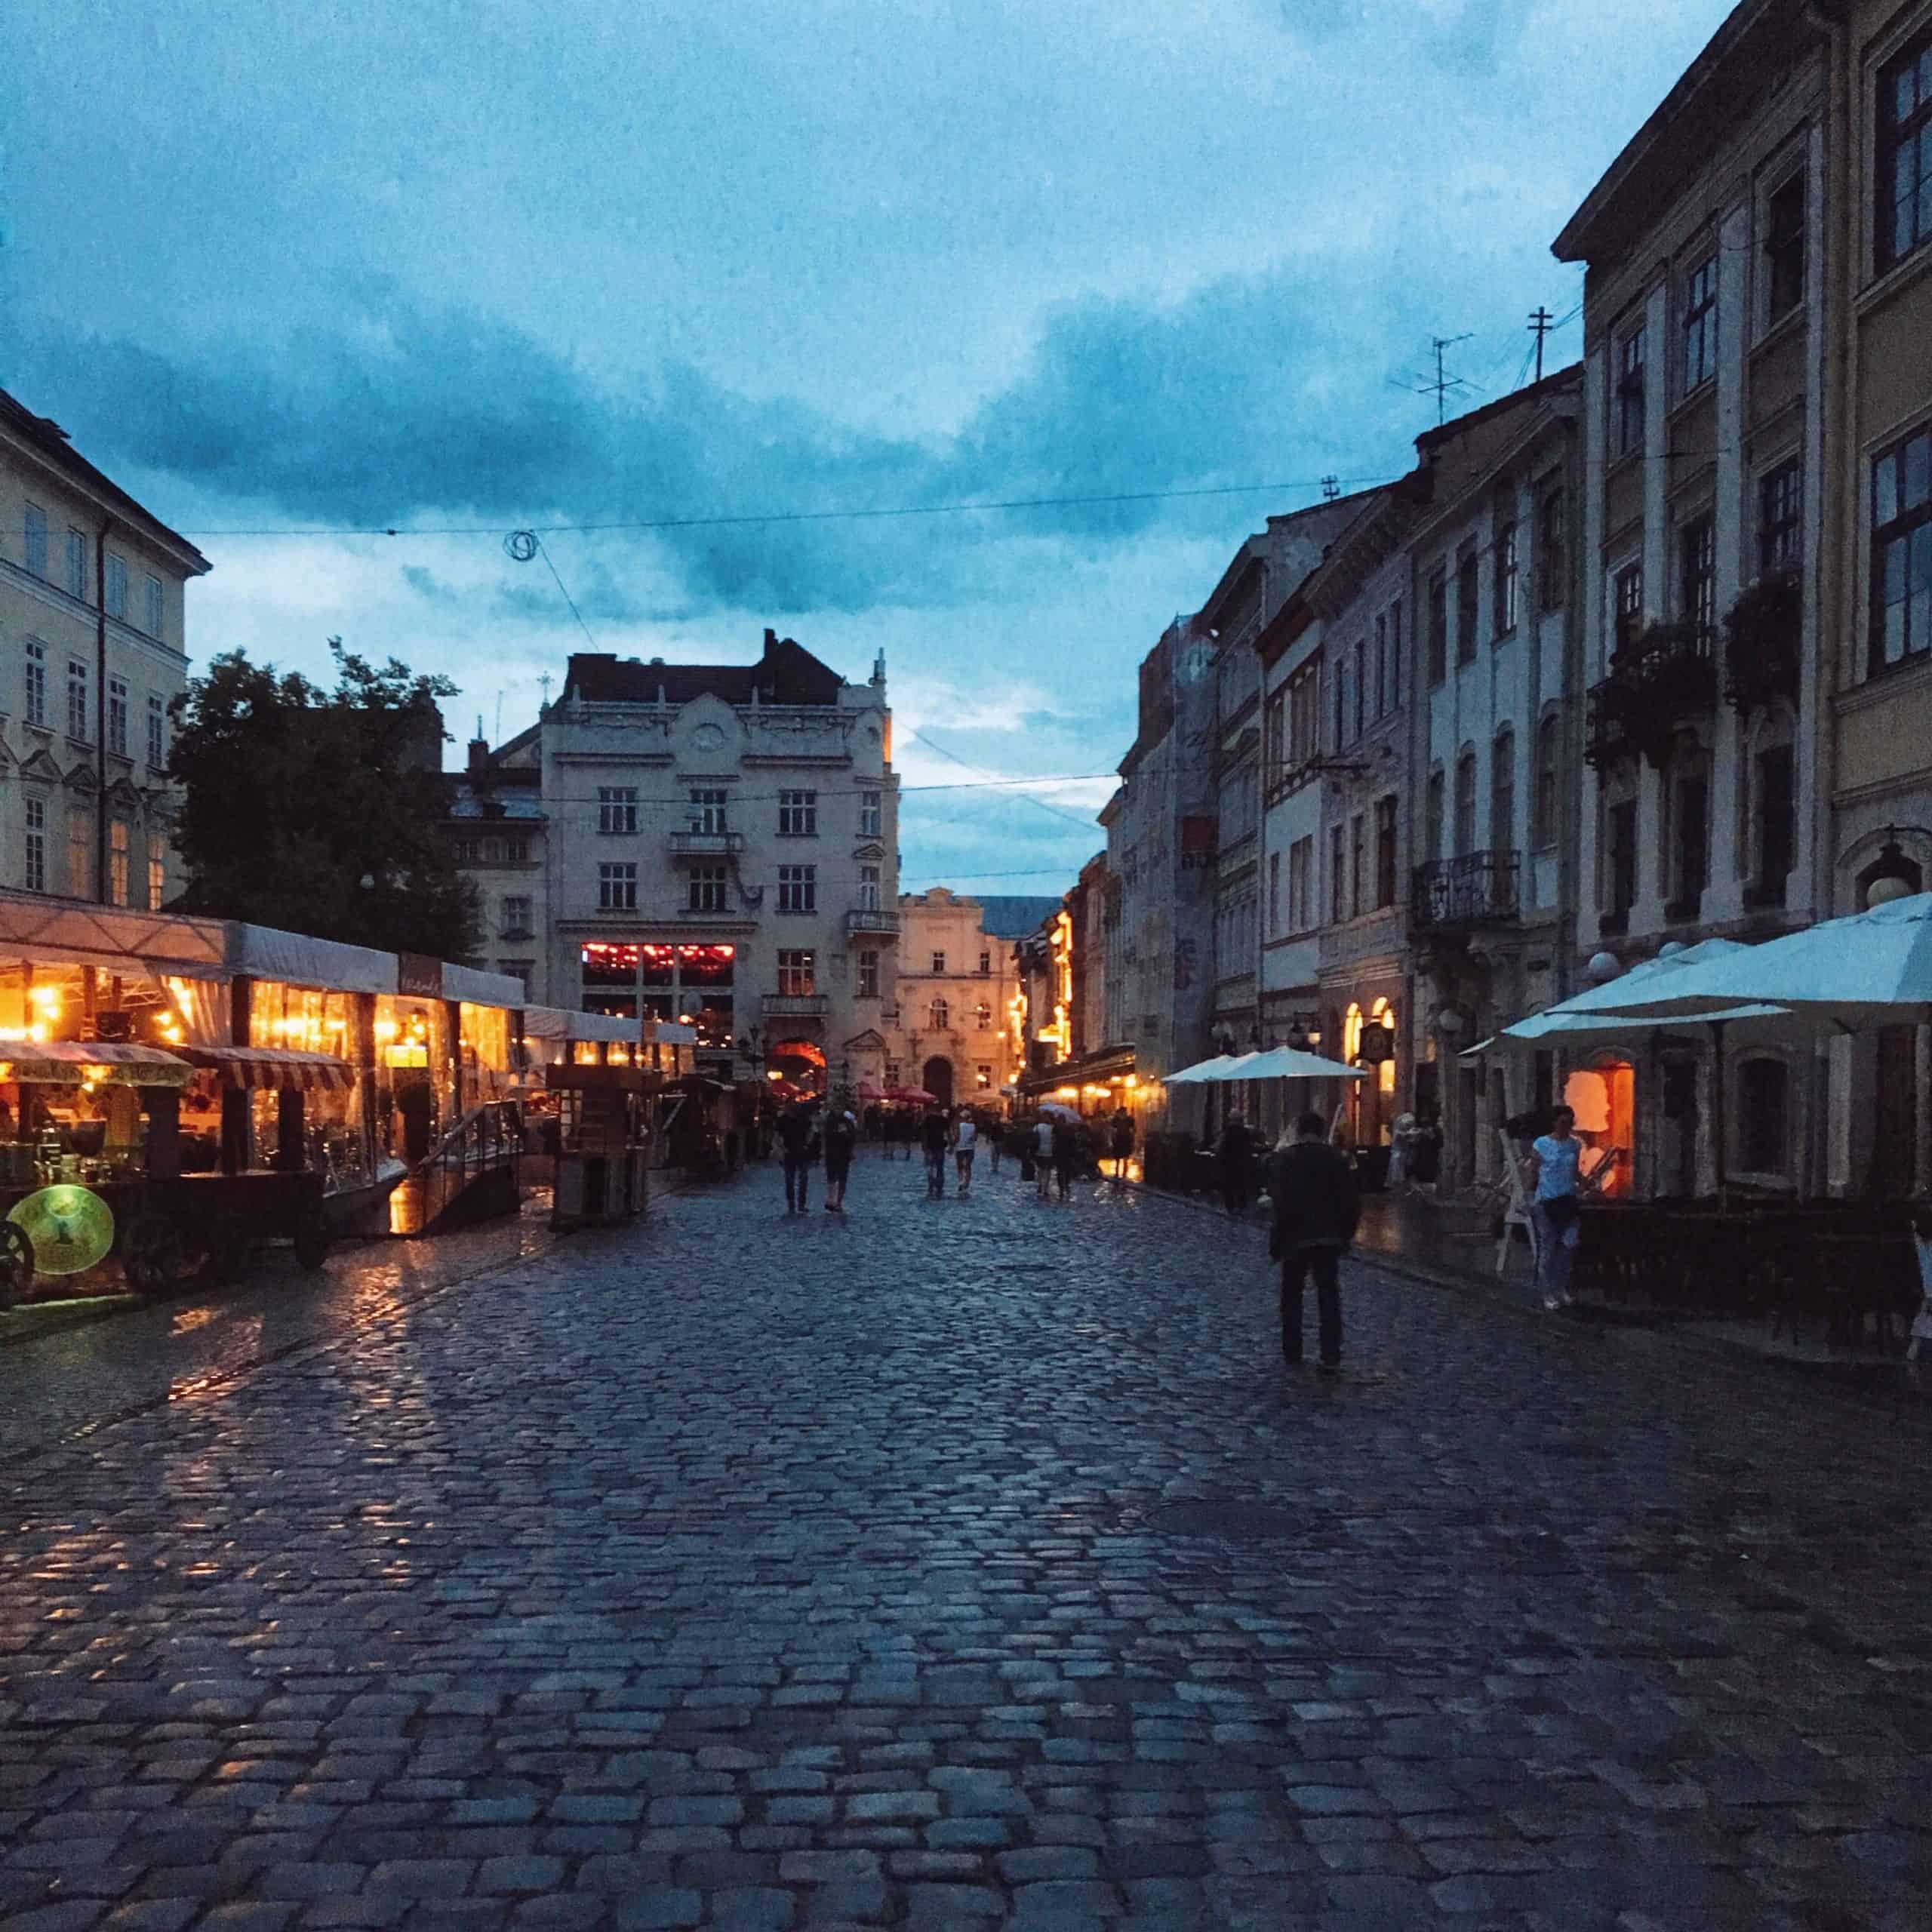 lviv ukraine at night